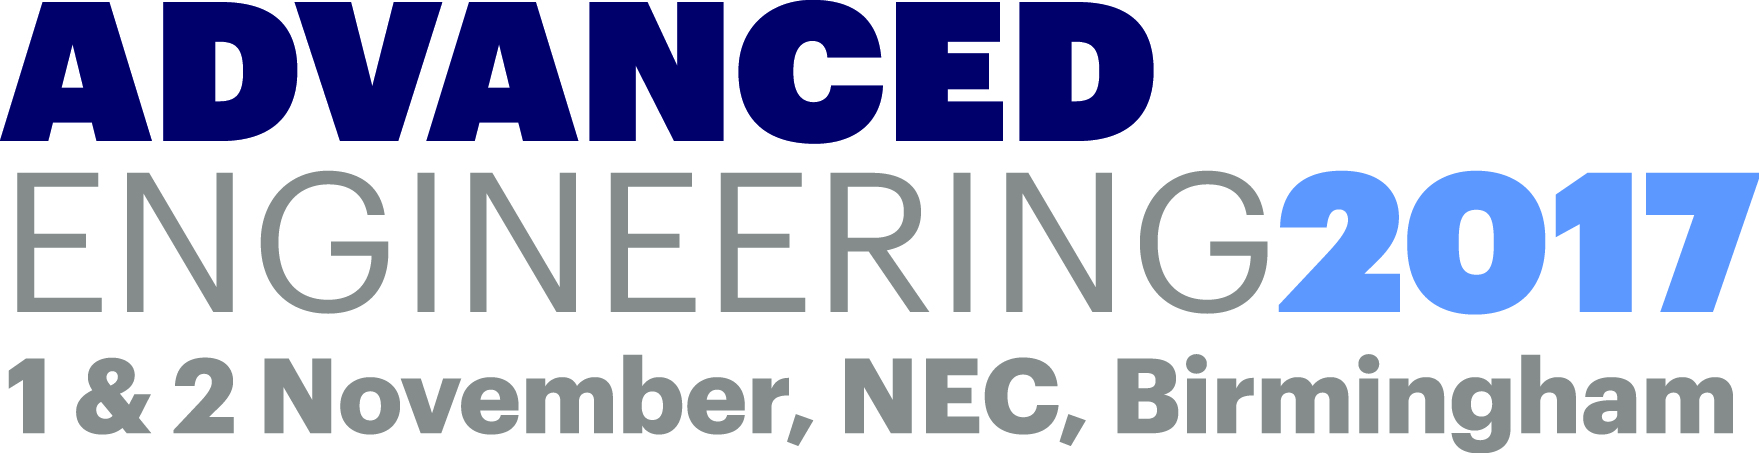 ADVANCED-ENGINEERING-2017-logo.jpg